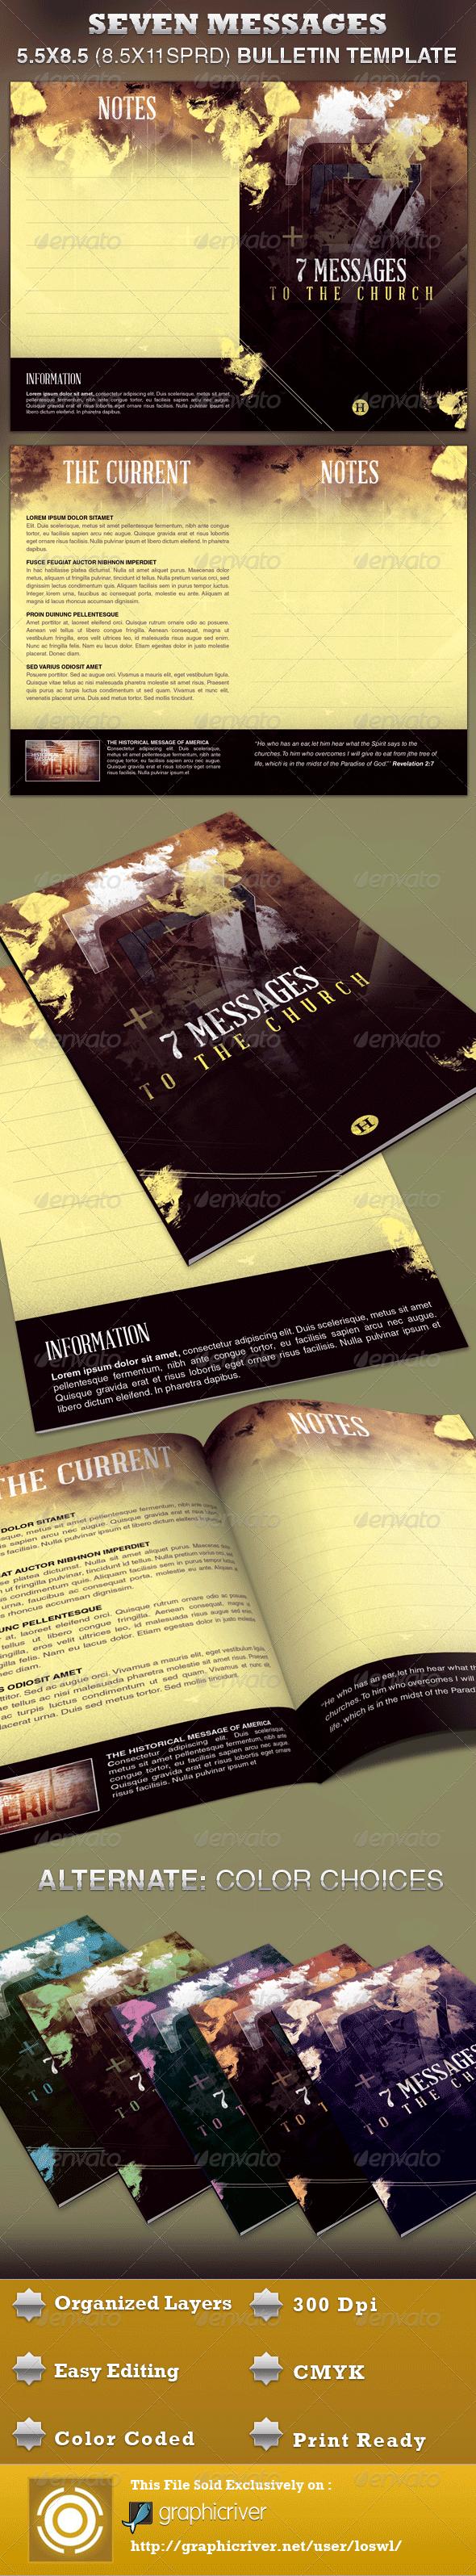 Seven Messages Church Bulletin Template - Informational Brochures